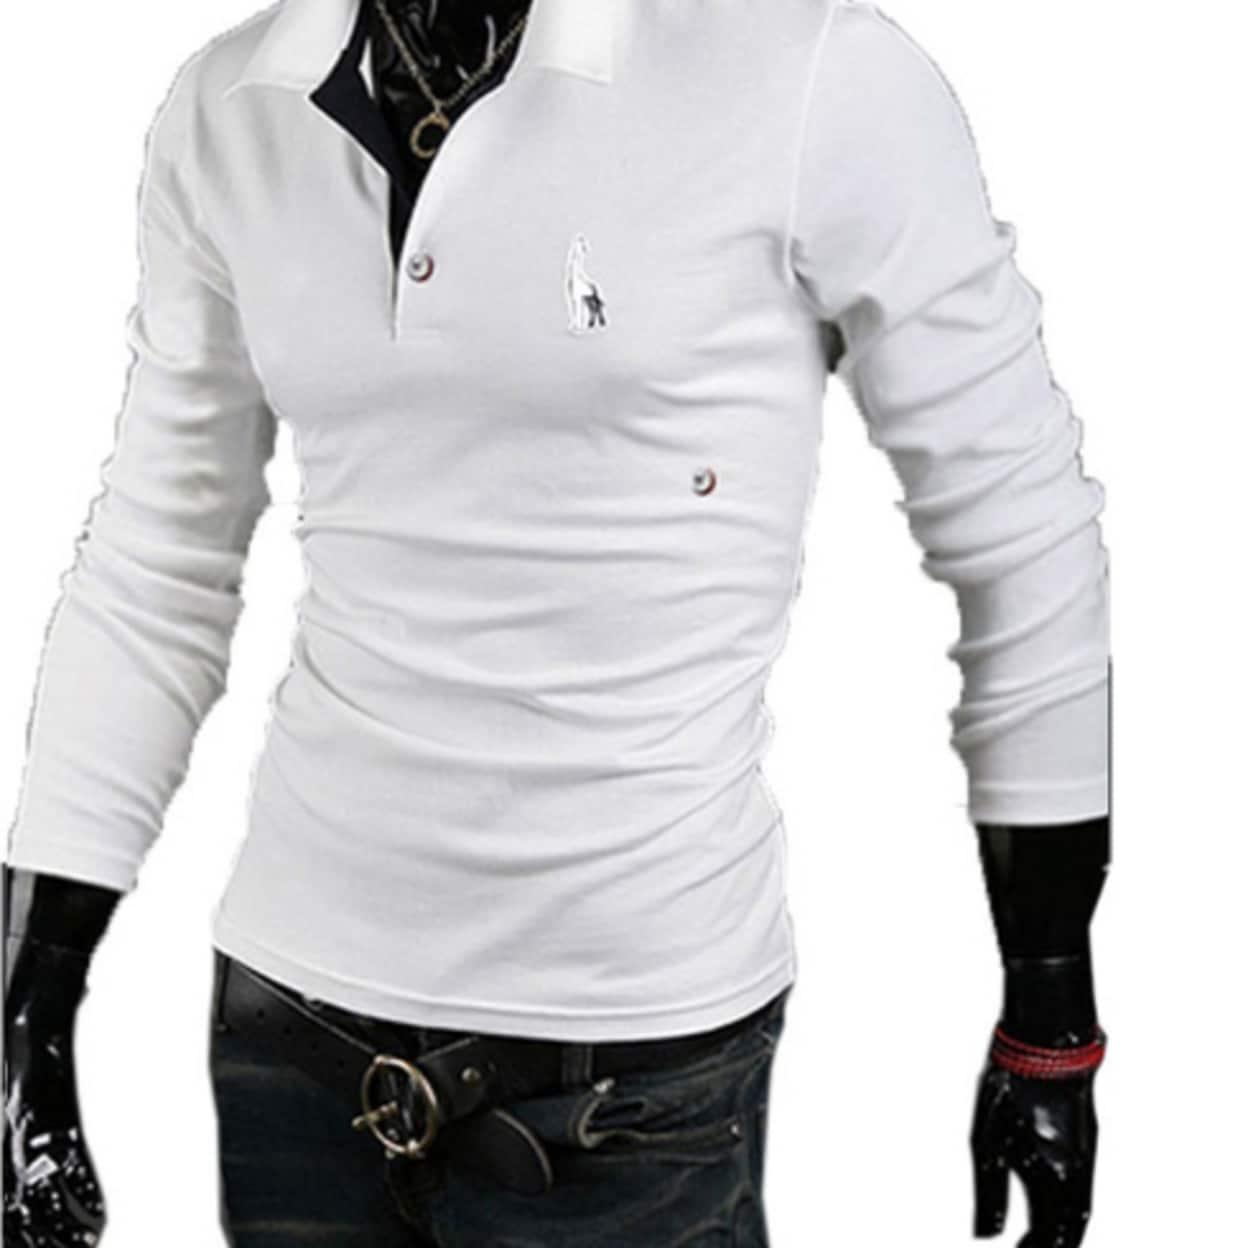 dd7e6a72088 Mens Casual Tops Tee V Neck Polo Shirts Slim Fit Short Sleeve M-2XL